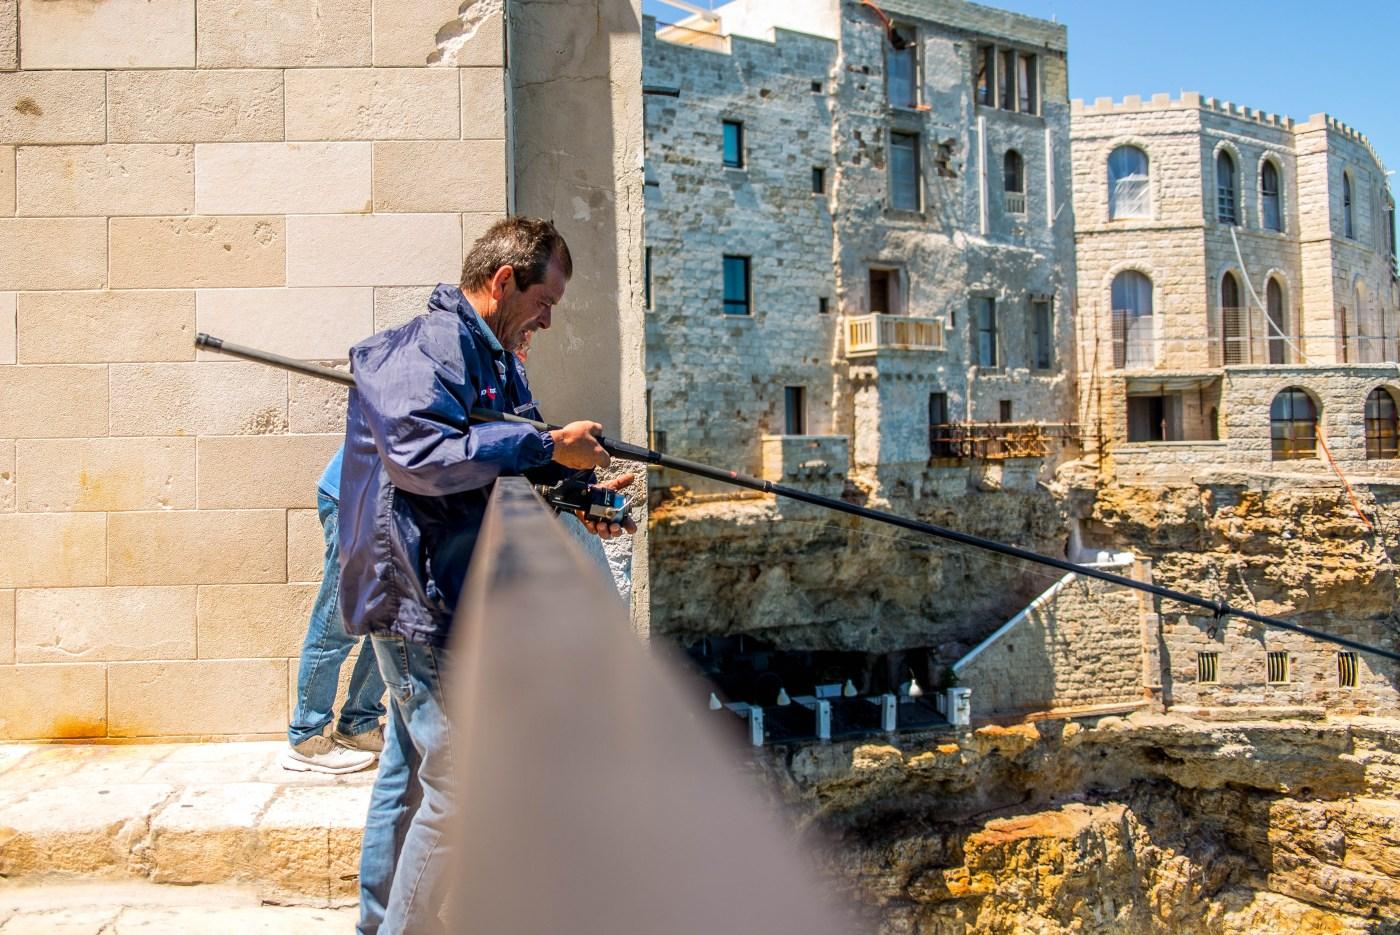 Polignano a mare italie voyage blog icietlabas blogvoyage ici et là-bas www.icietlabas.fr